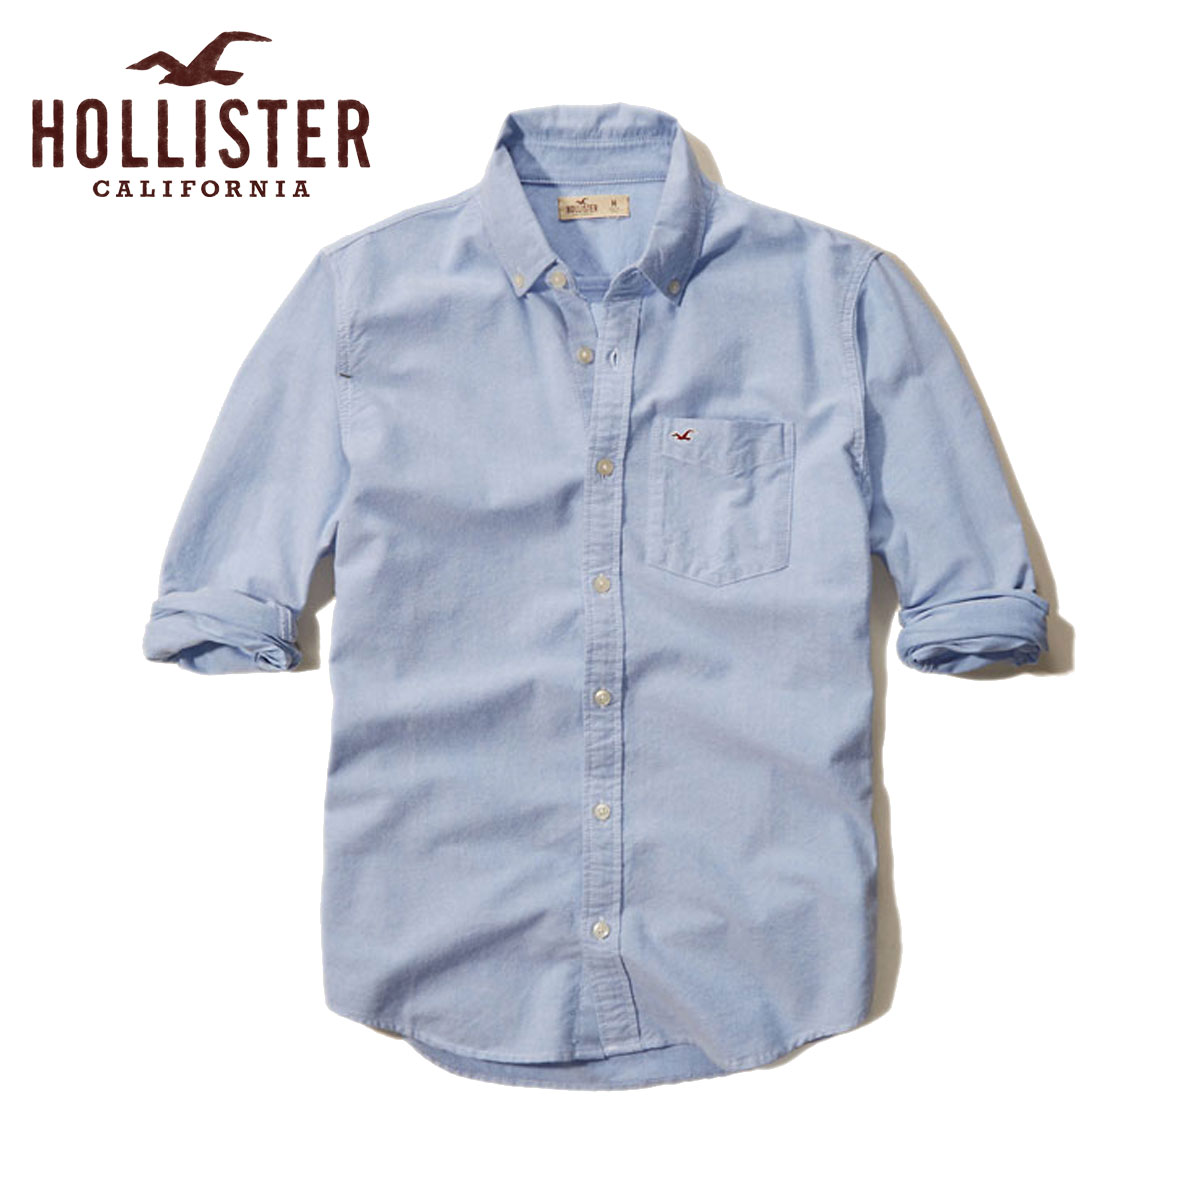 horisuta HOLLISTER正规的物品人长袖子衬衫Solid Oxford Shirt 325-259-1431-210